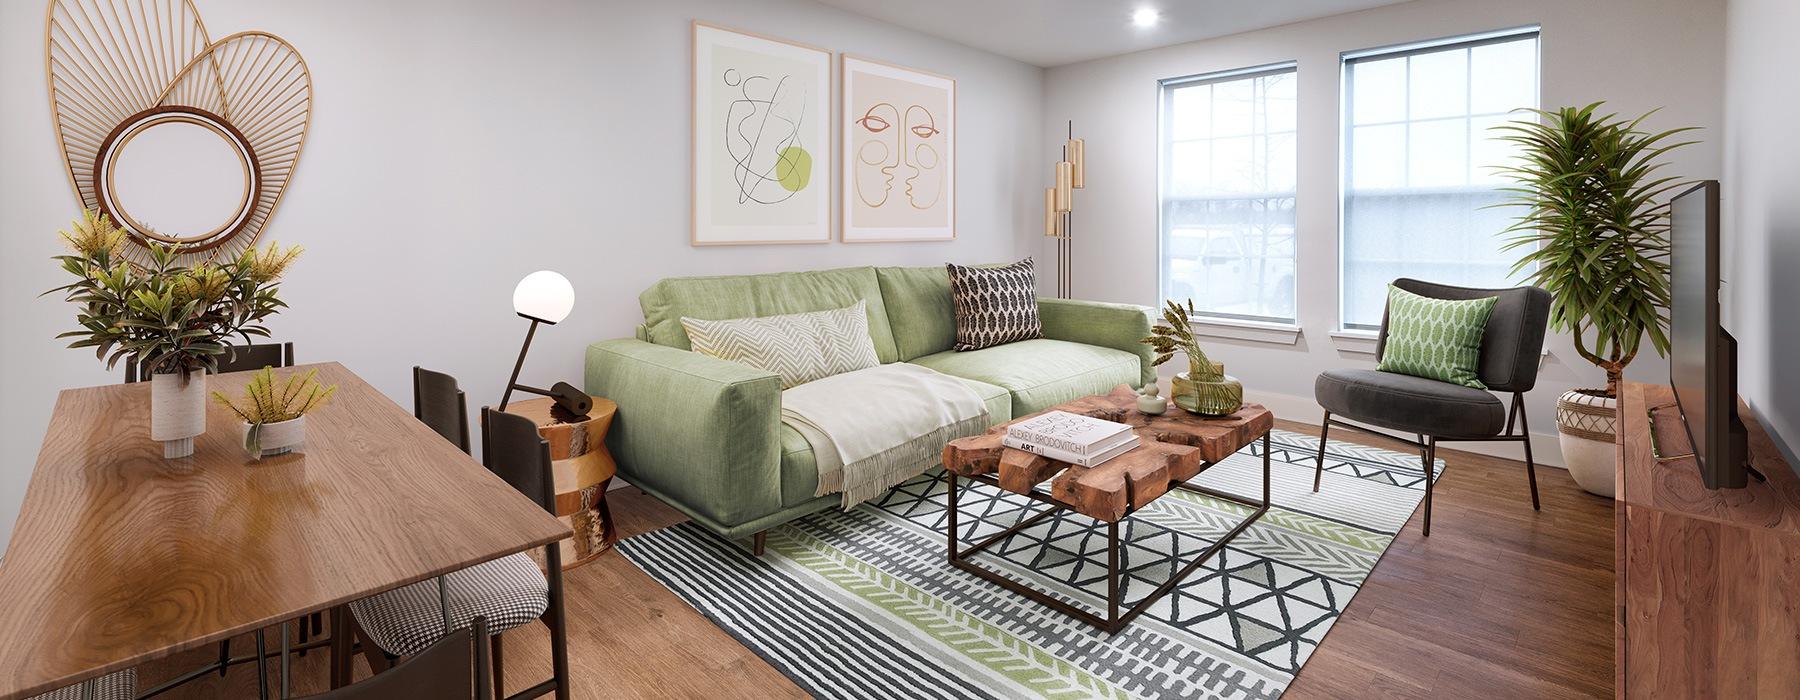 spacious living room on wood-style flooring